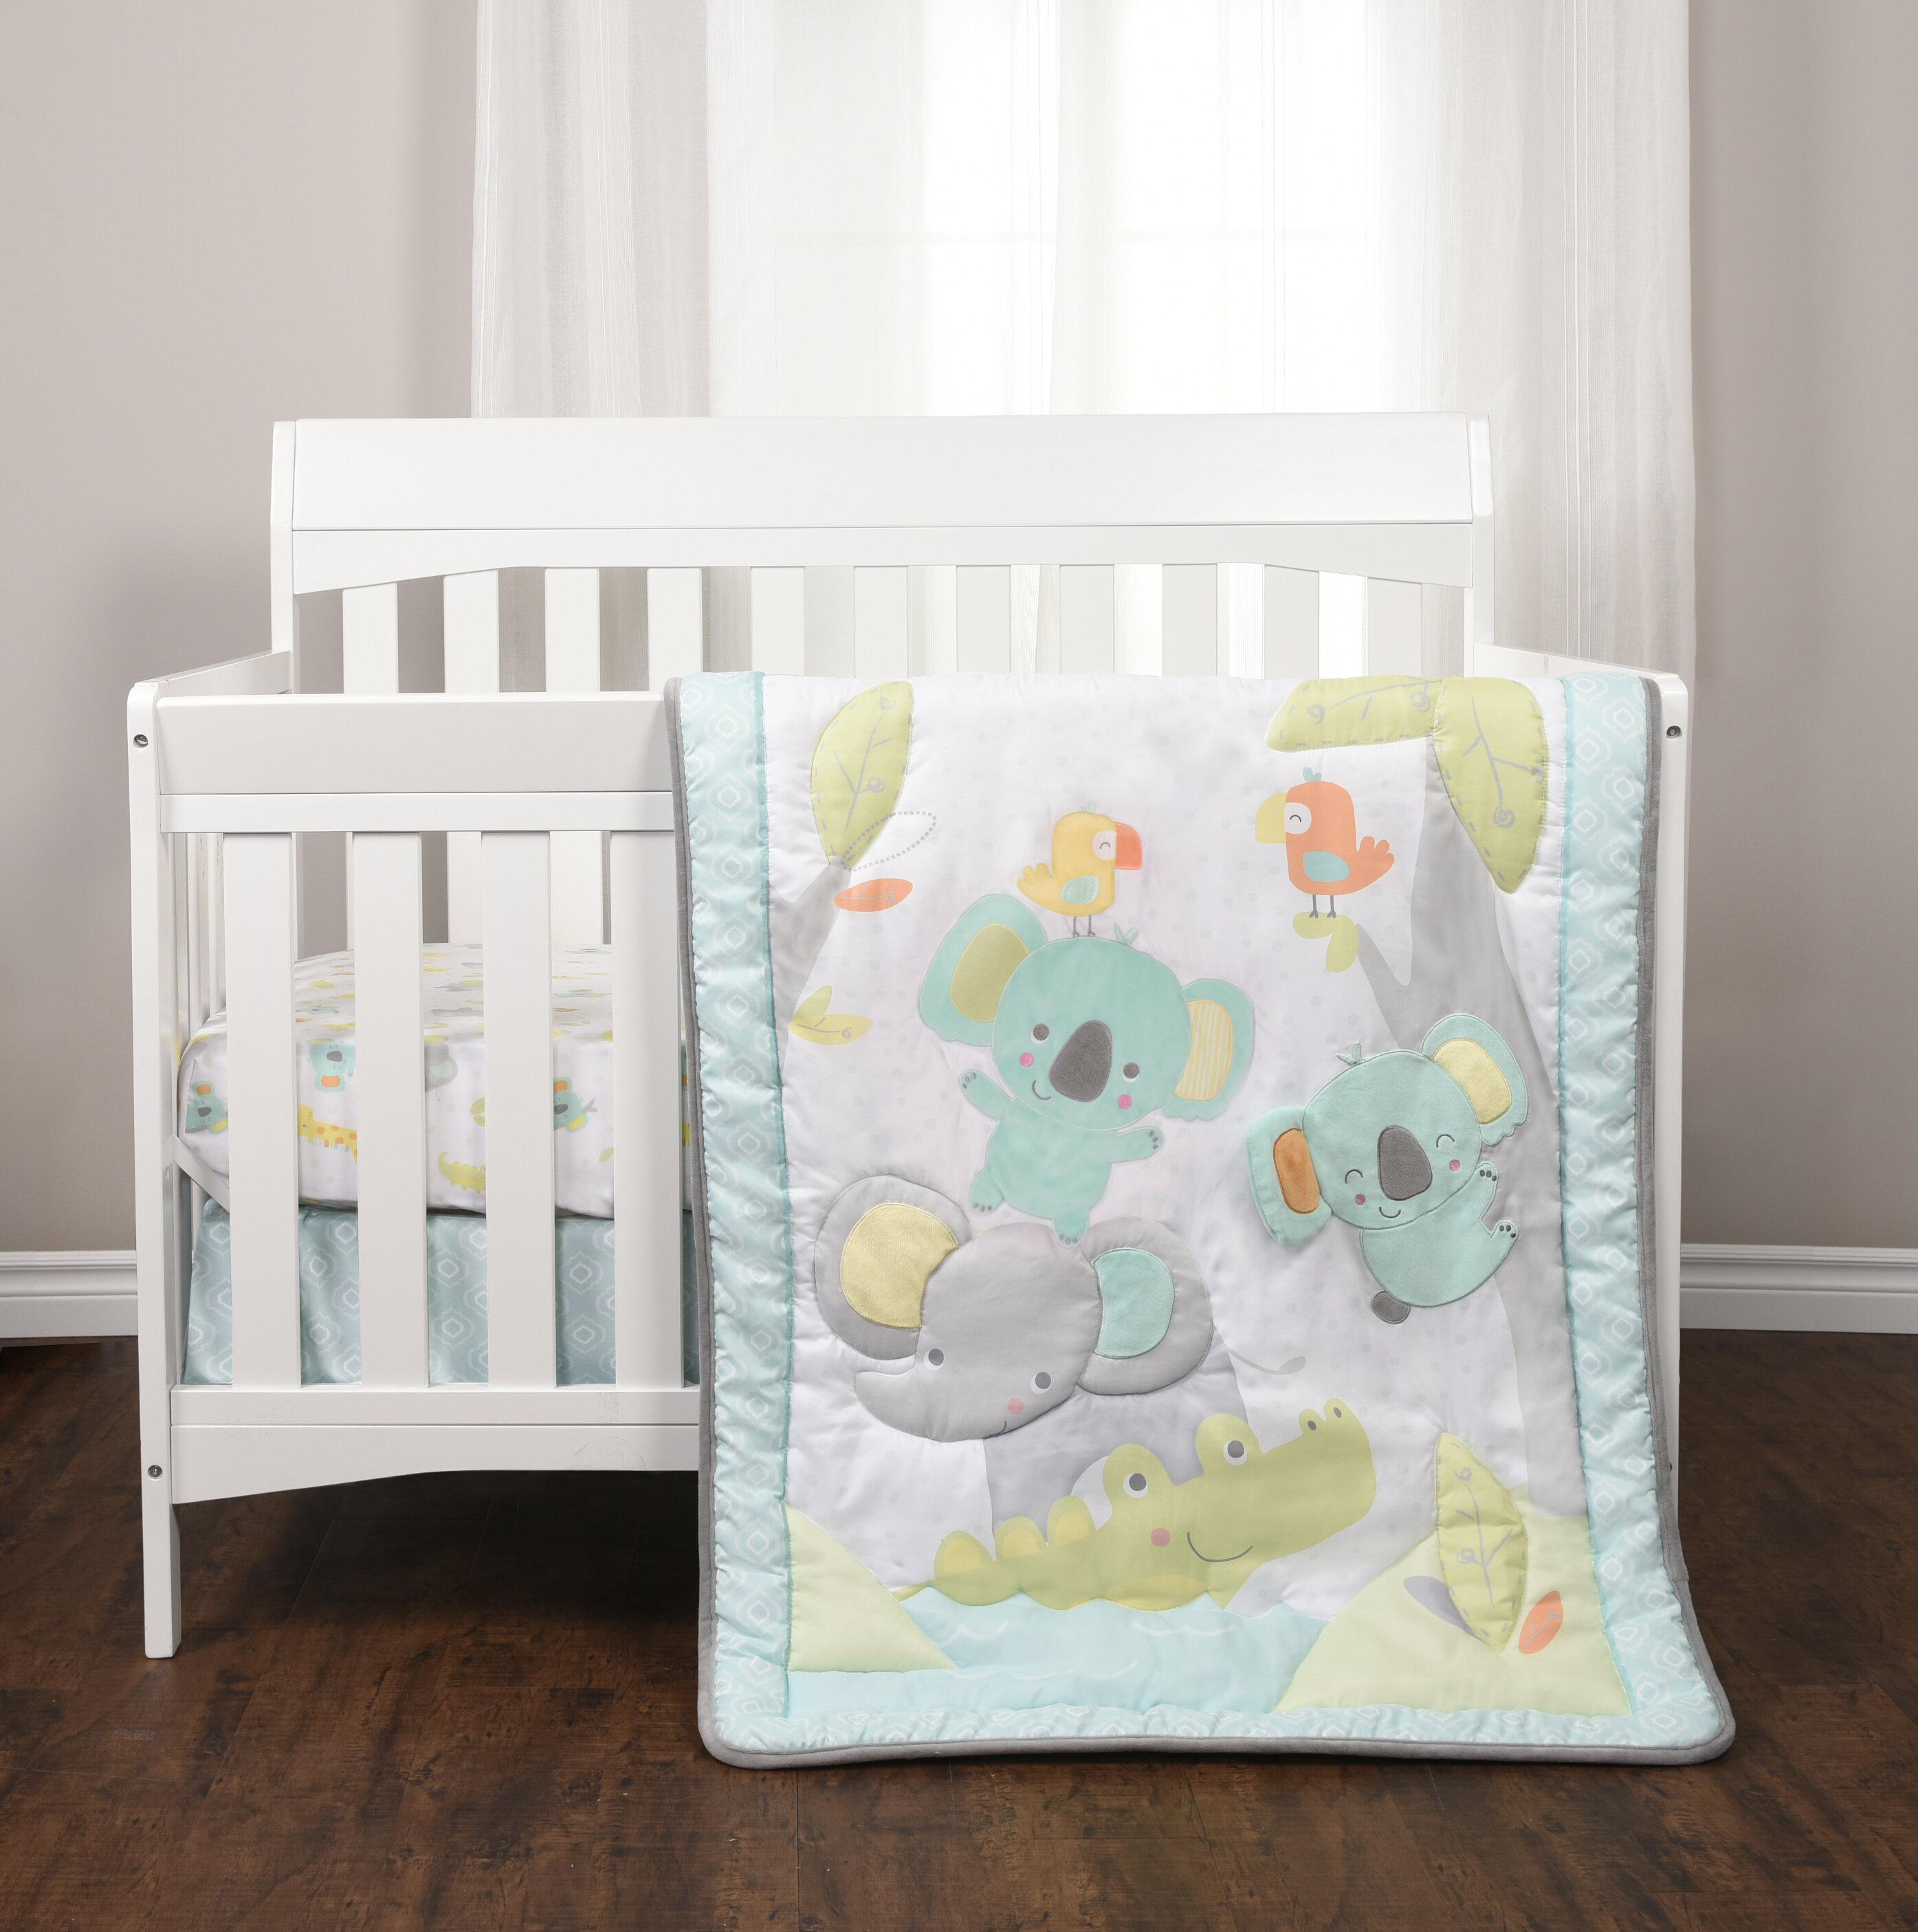 a7564b0798dd Harriet Bee Ashendon 3 Piece Crib Bedding Set